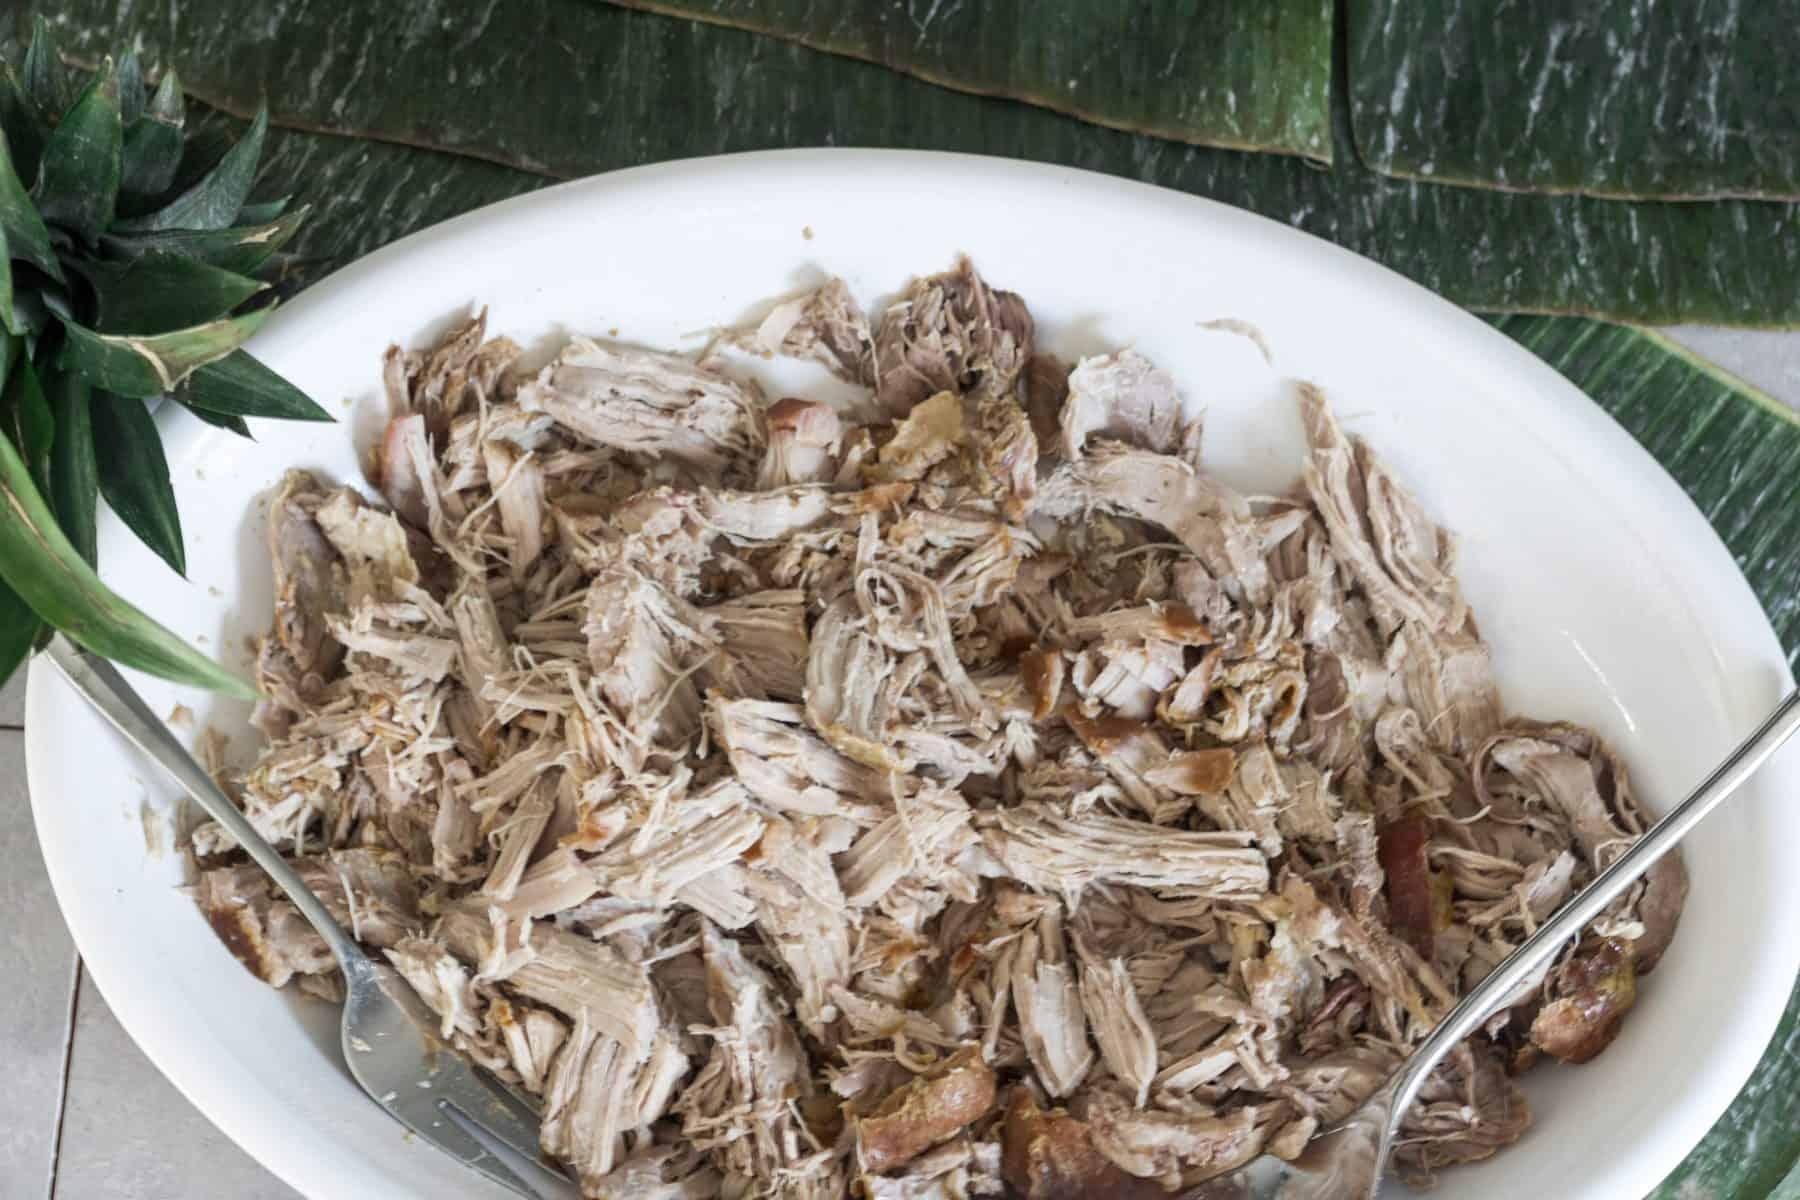 Shredded smoked kalua pork